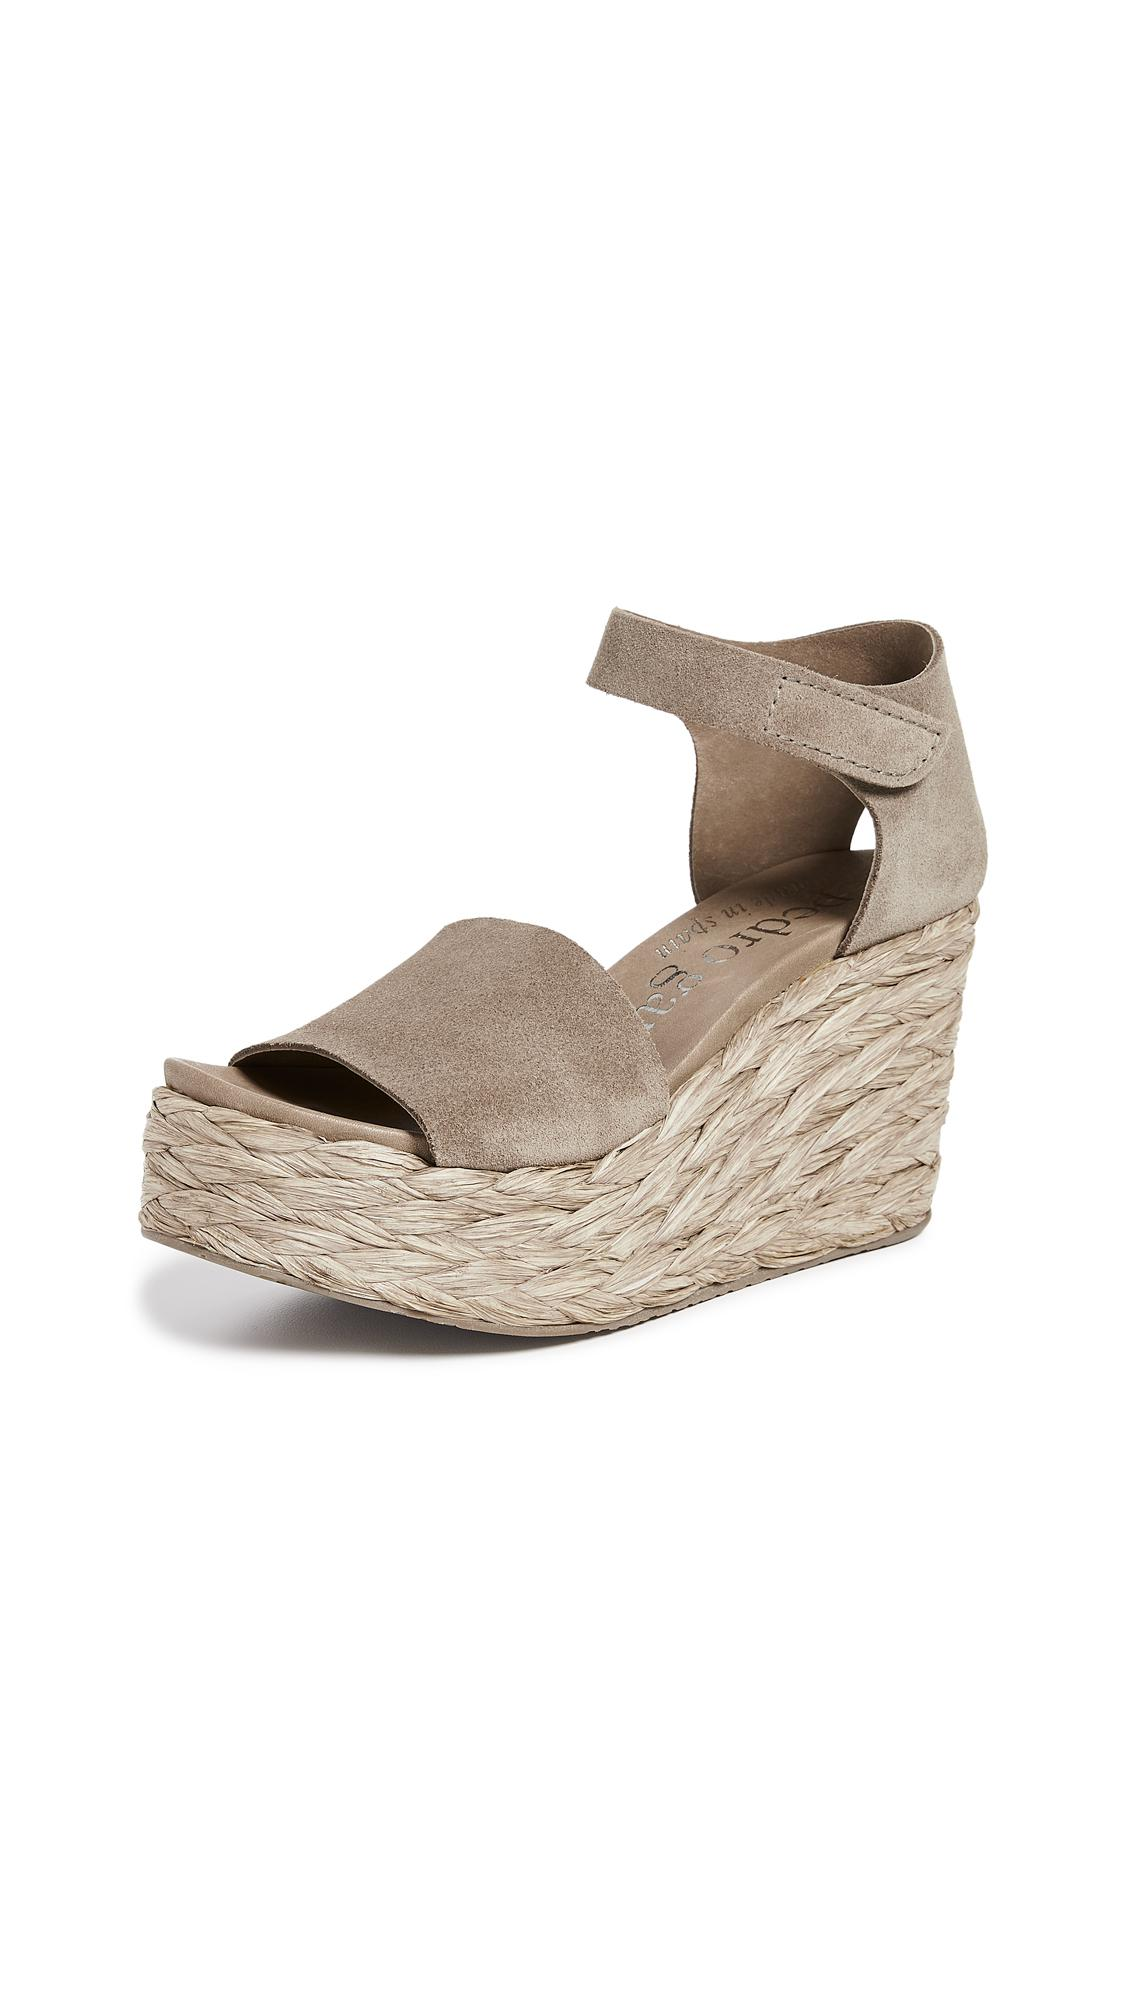 0b966f50e4e Lyst - Pedro Garcia Dory Wedge Sandals